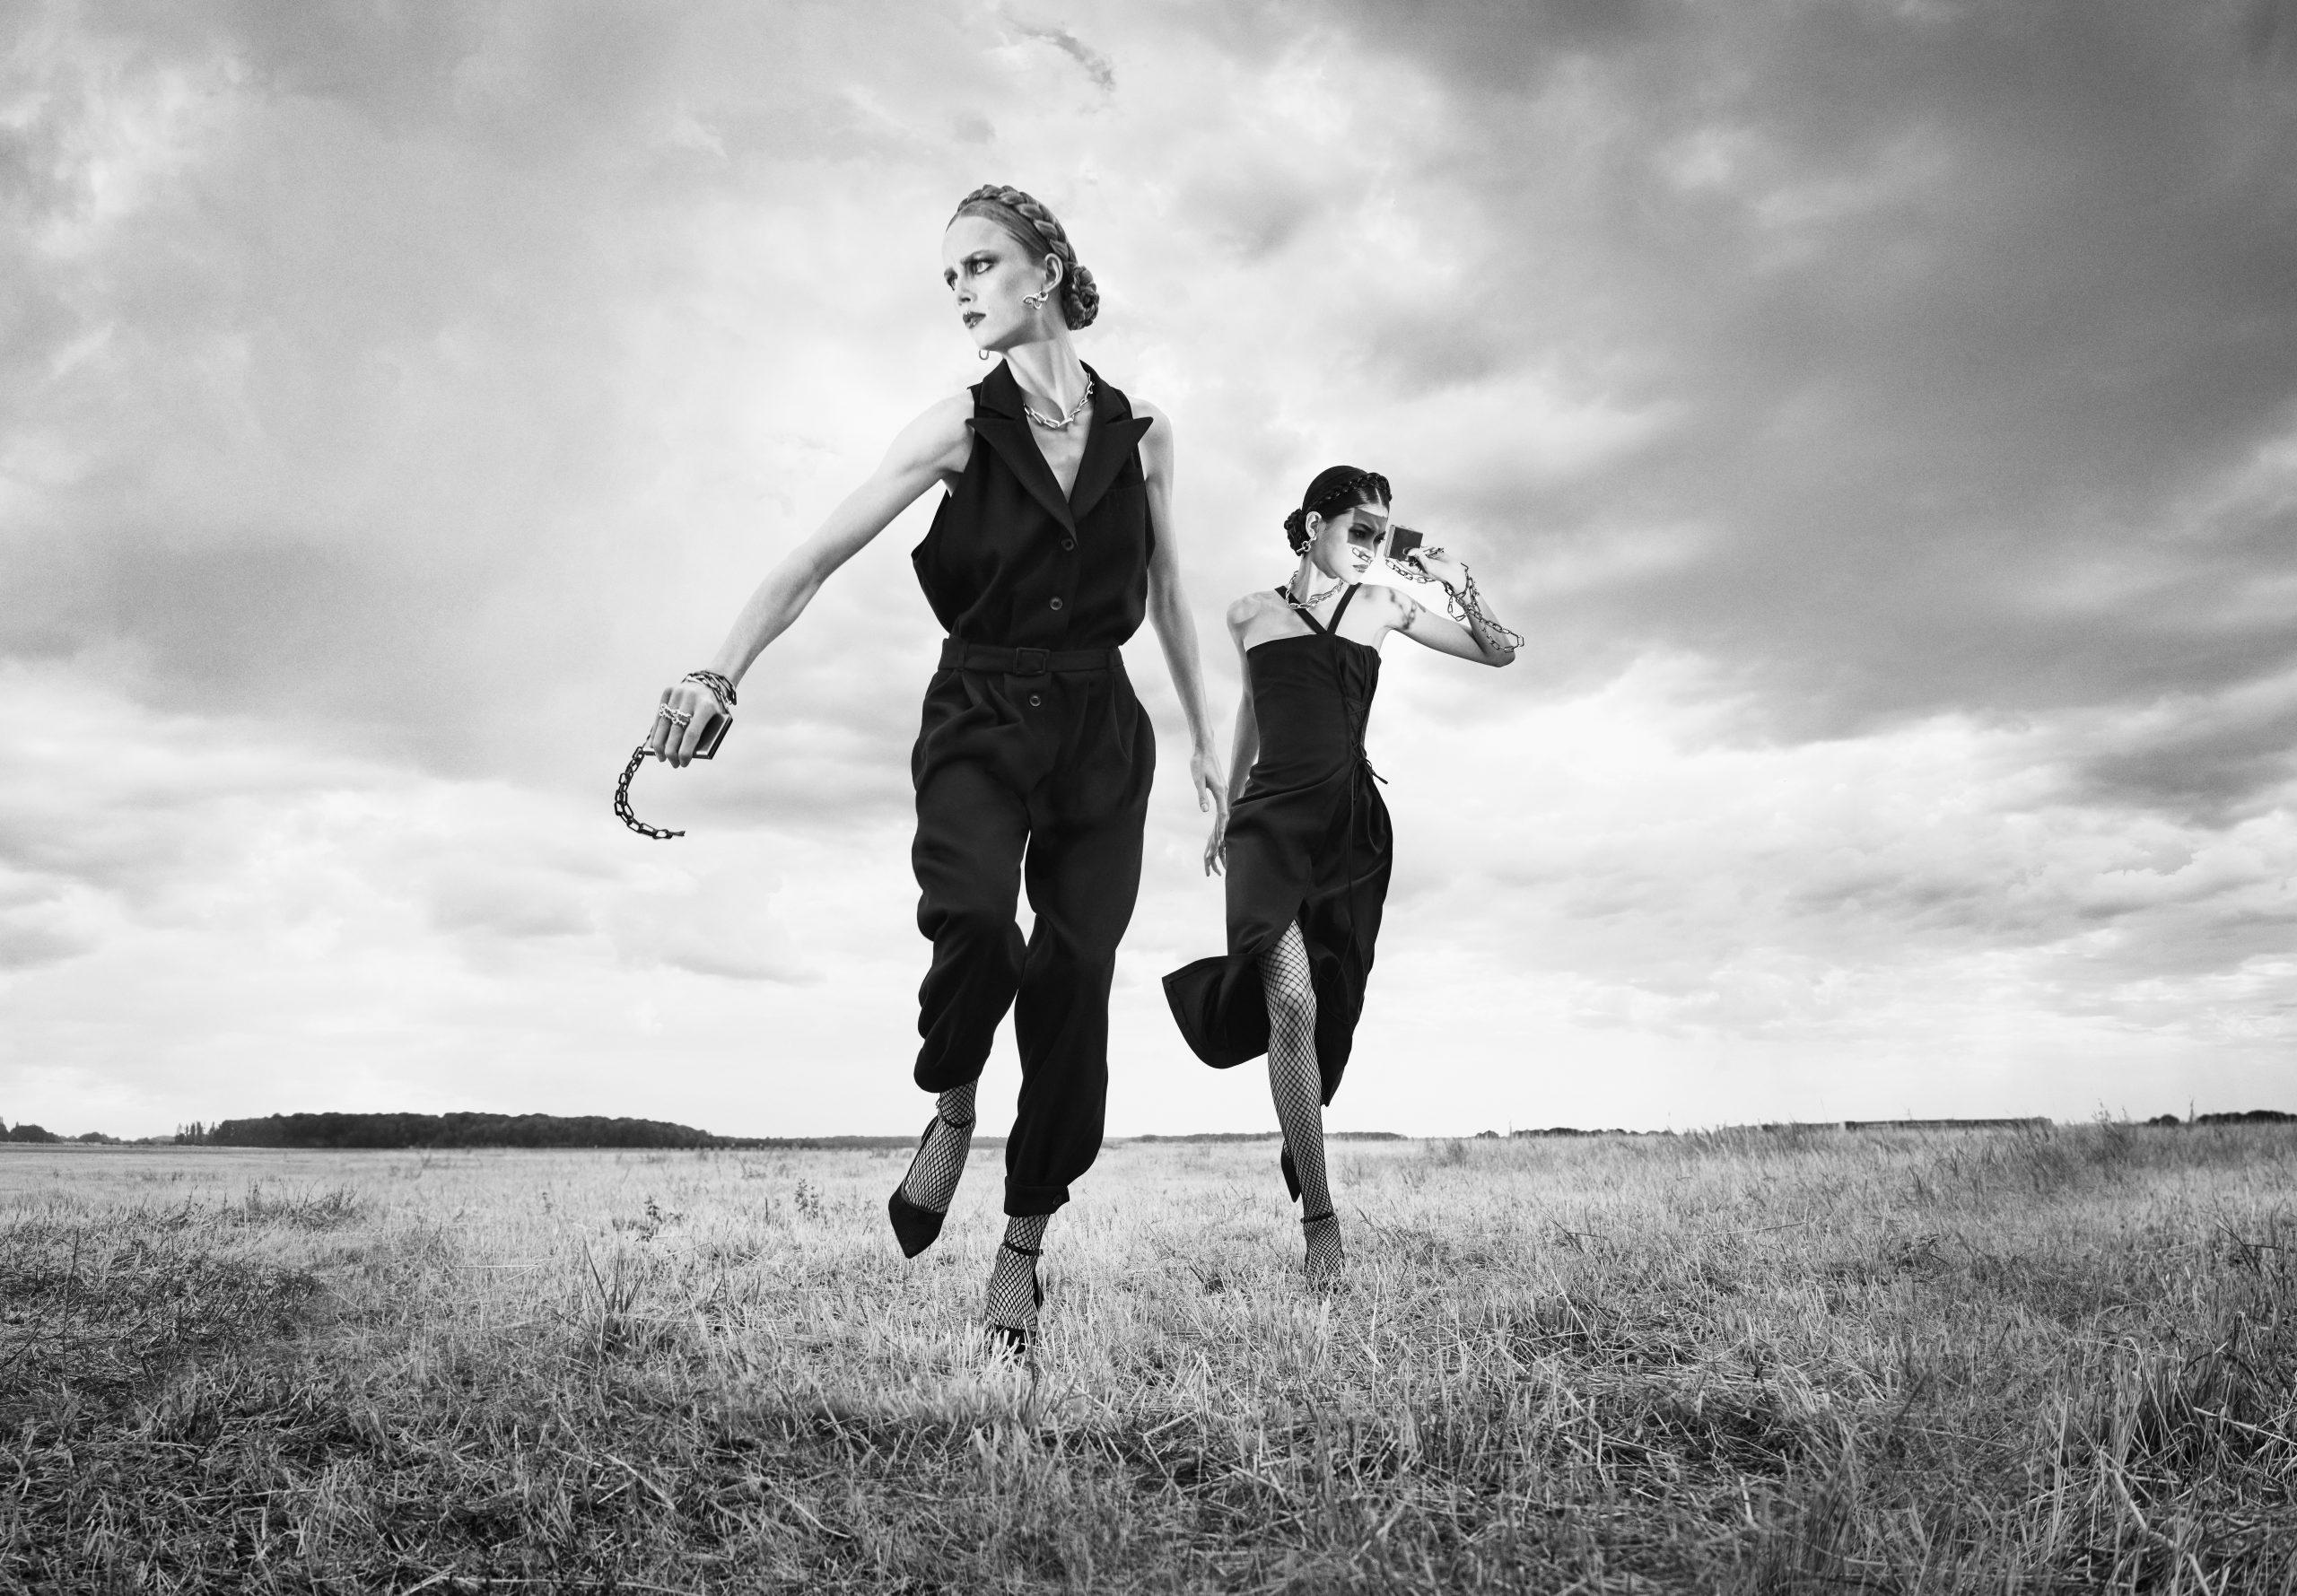 Zara Fall 2020 Ad Campaign Film & Photos